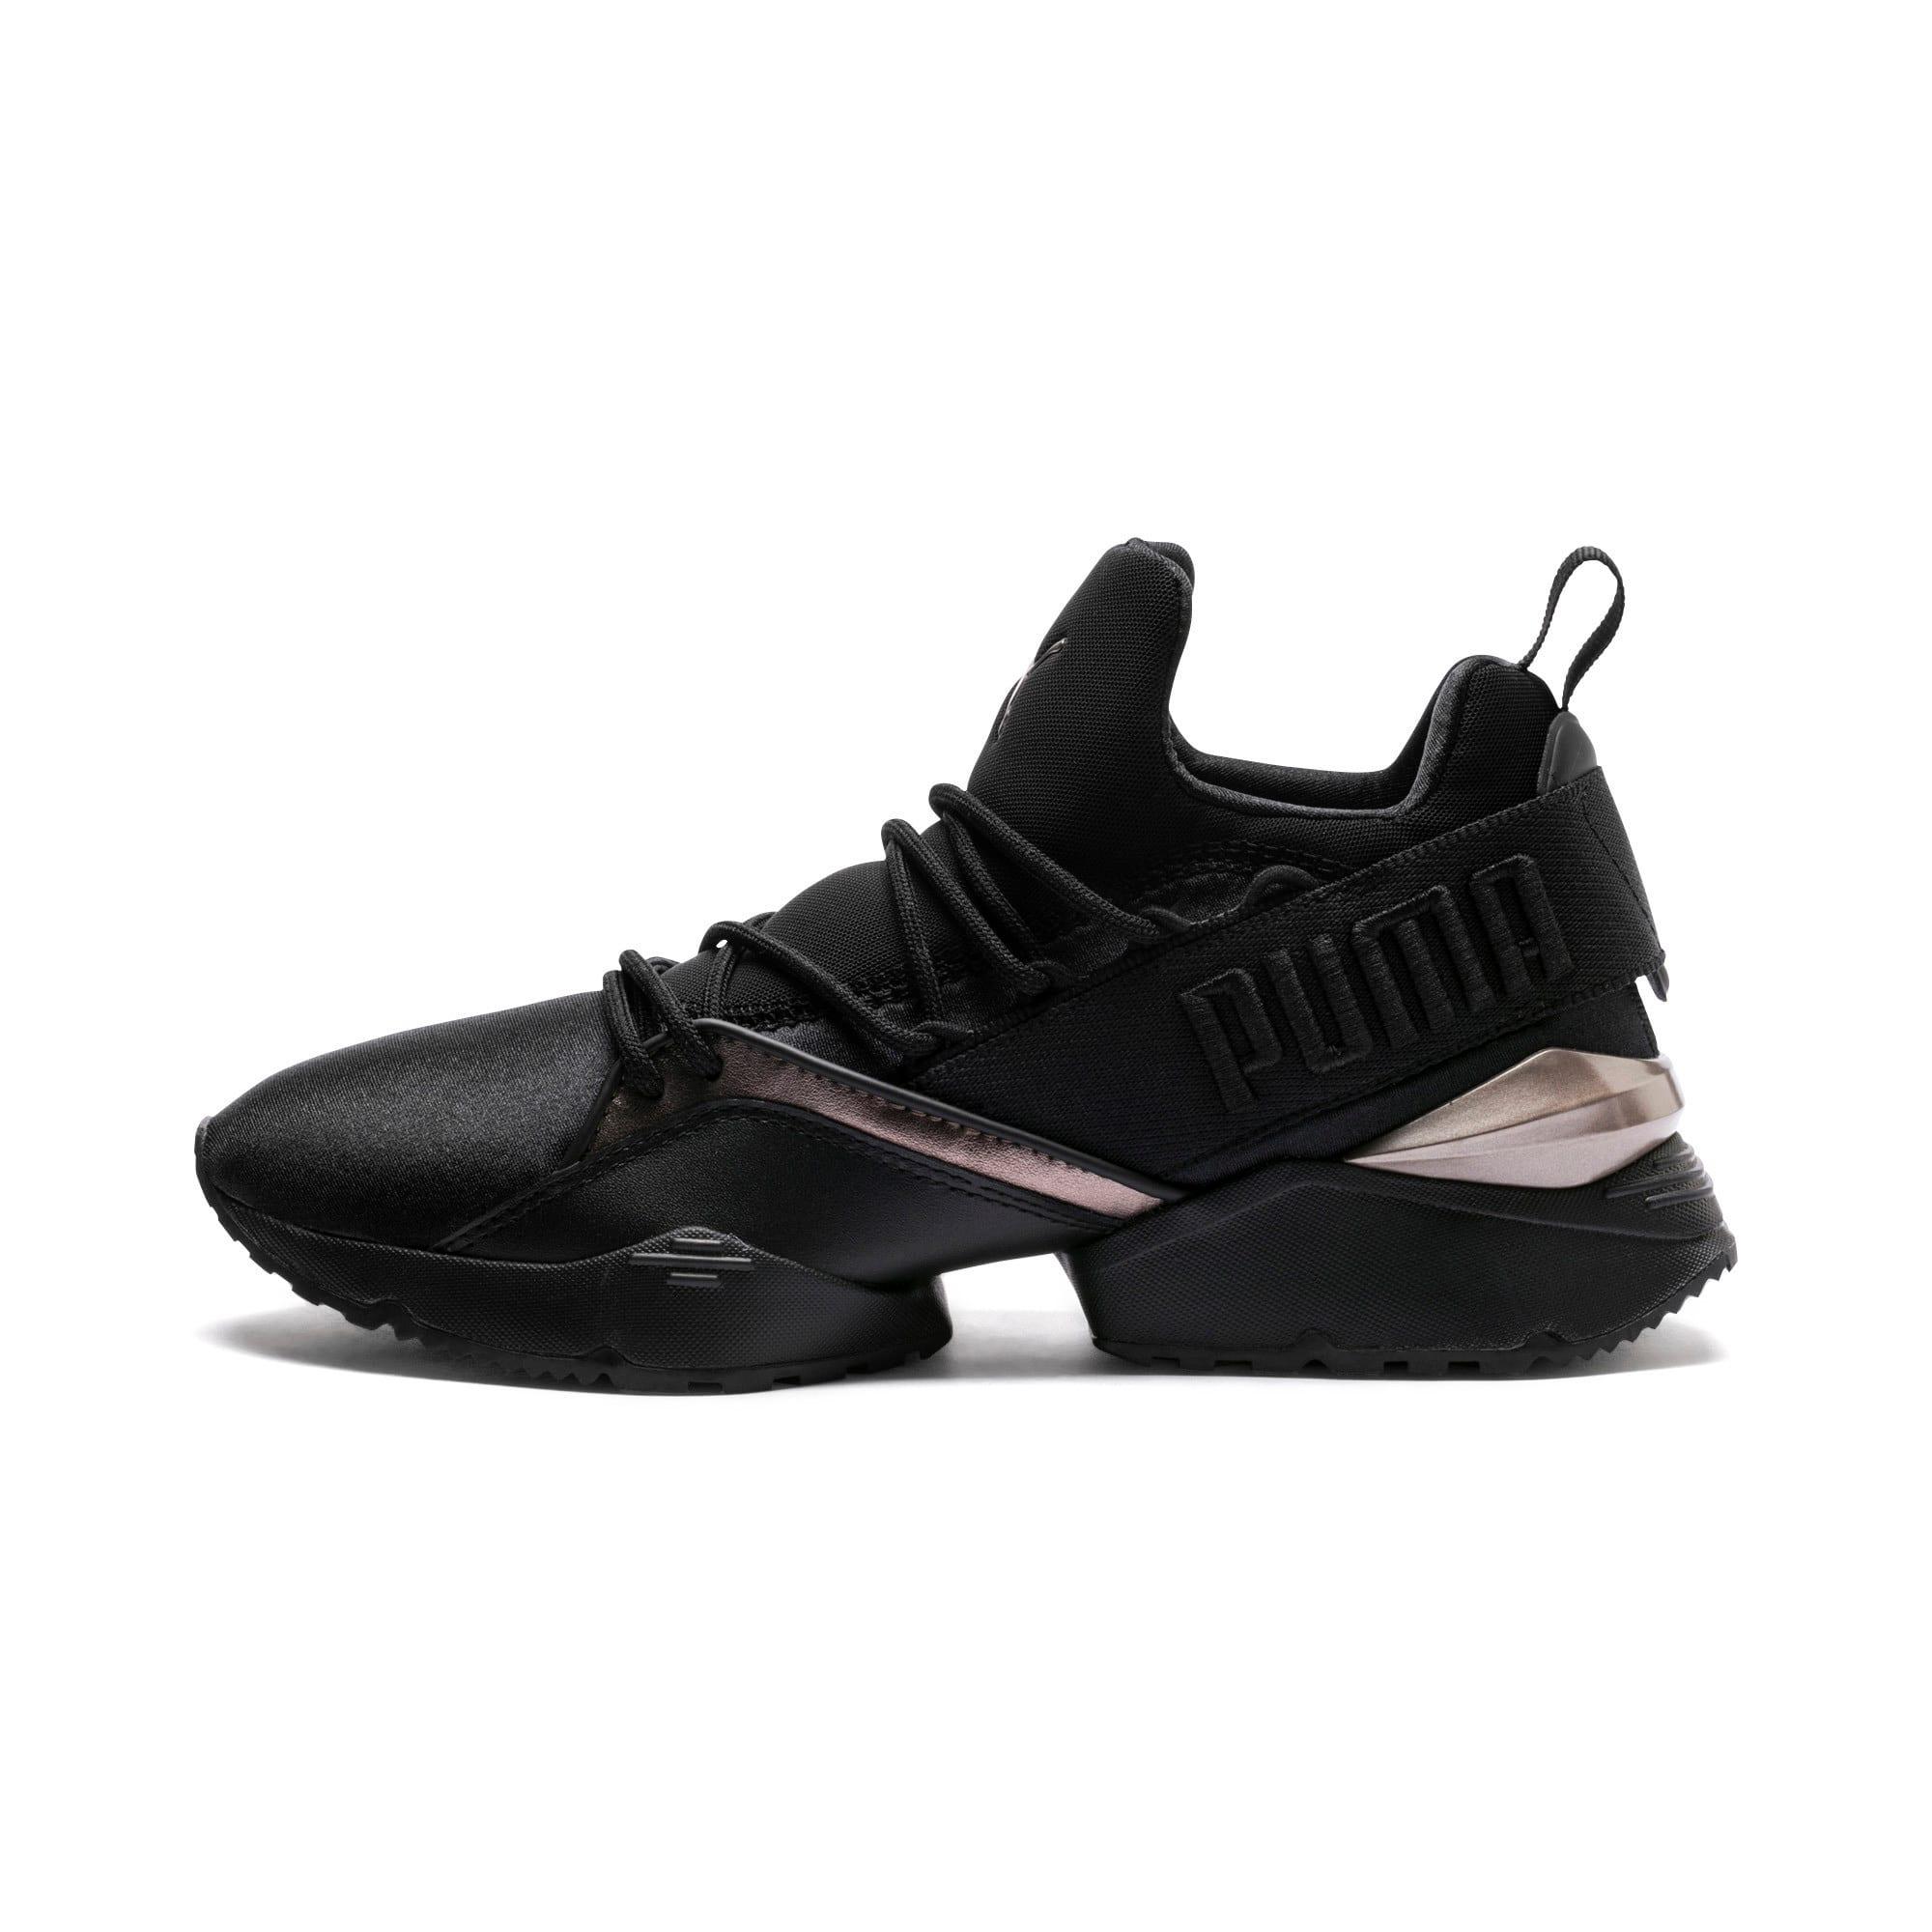 Thumbnail 1 of Muse Maia Luxe Women's Sneakers, Puma Black-Puma Black, medium